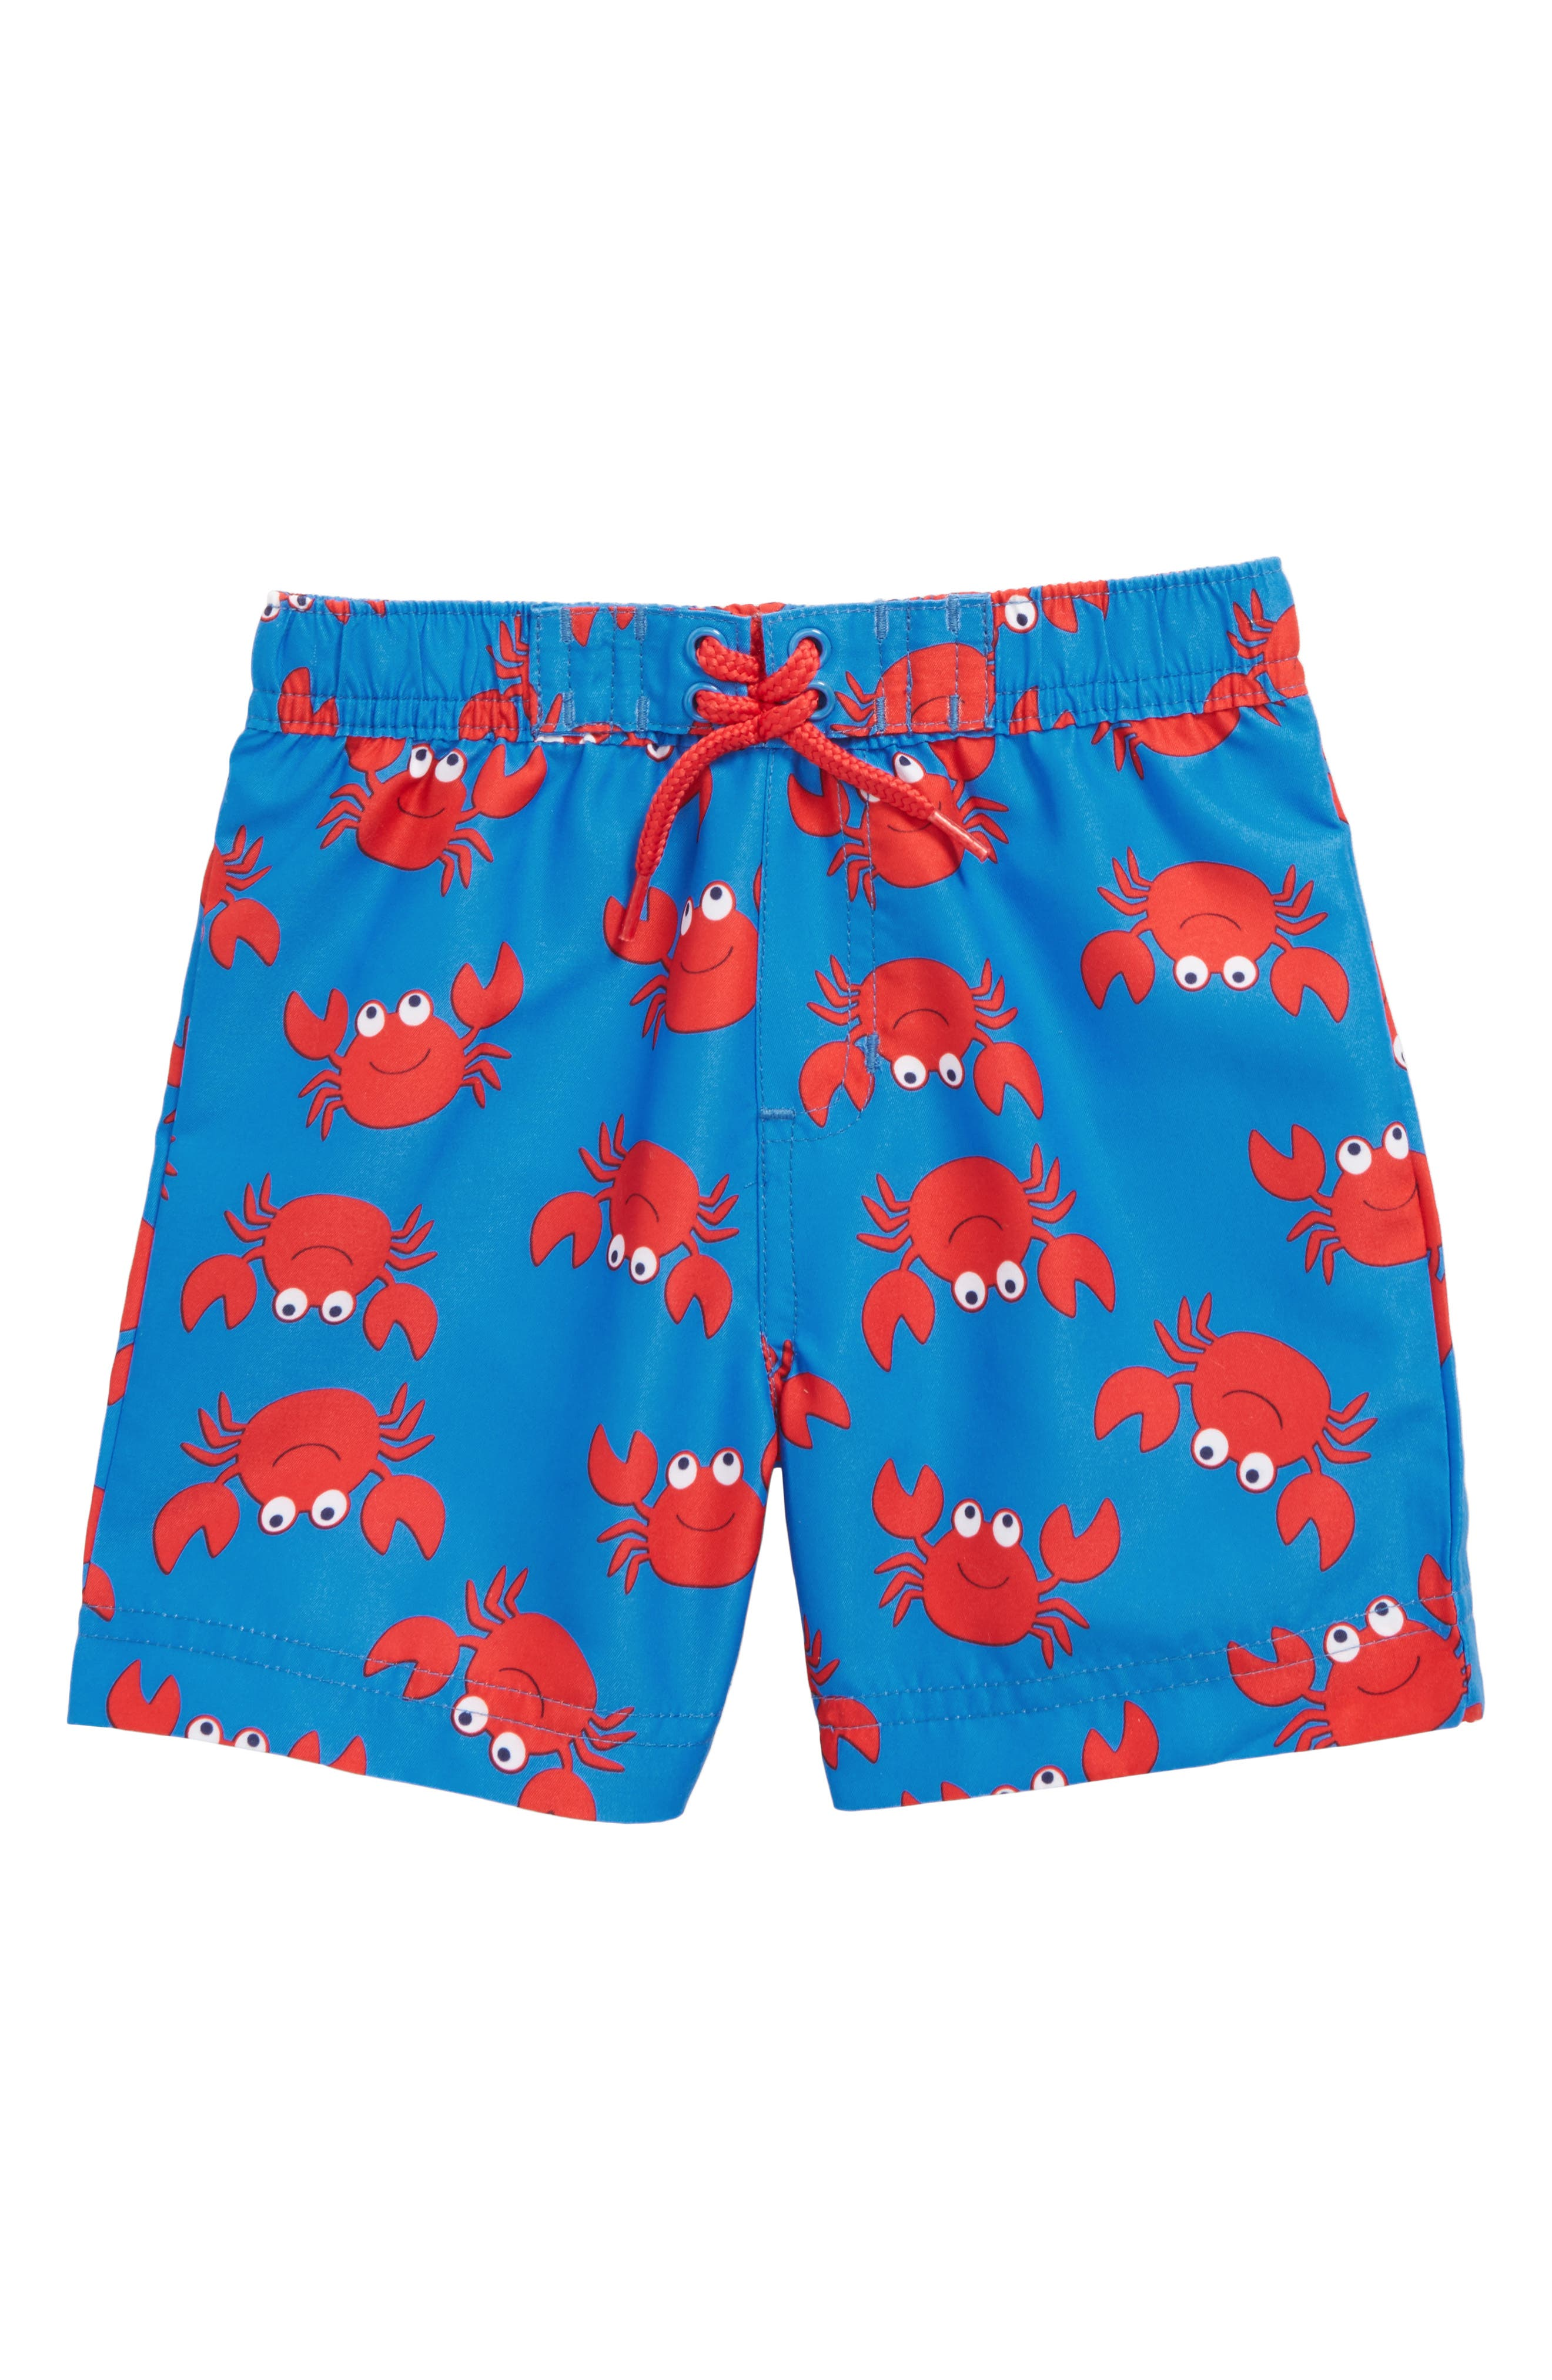 Crab UPF 50+ Swim Trunks,                         Main,                         color, Blue